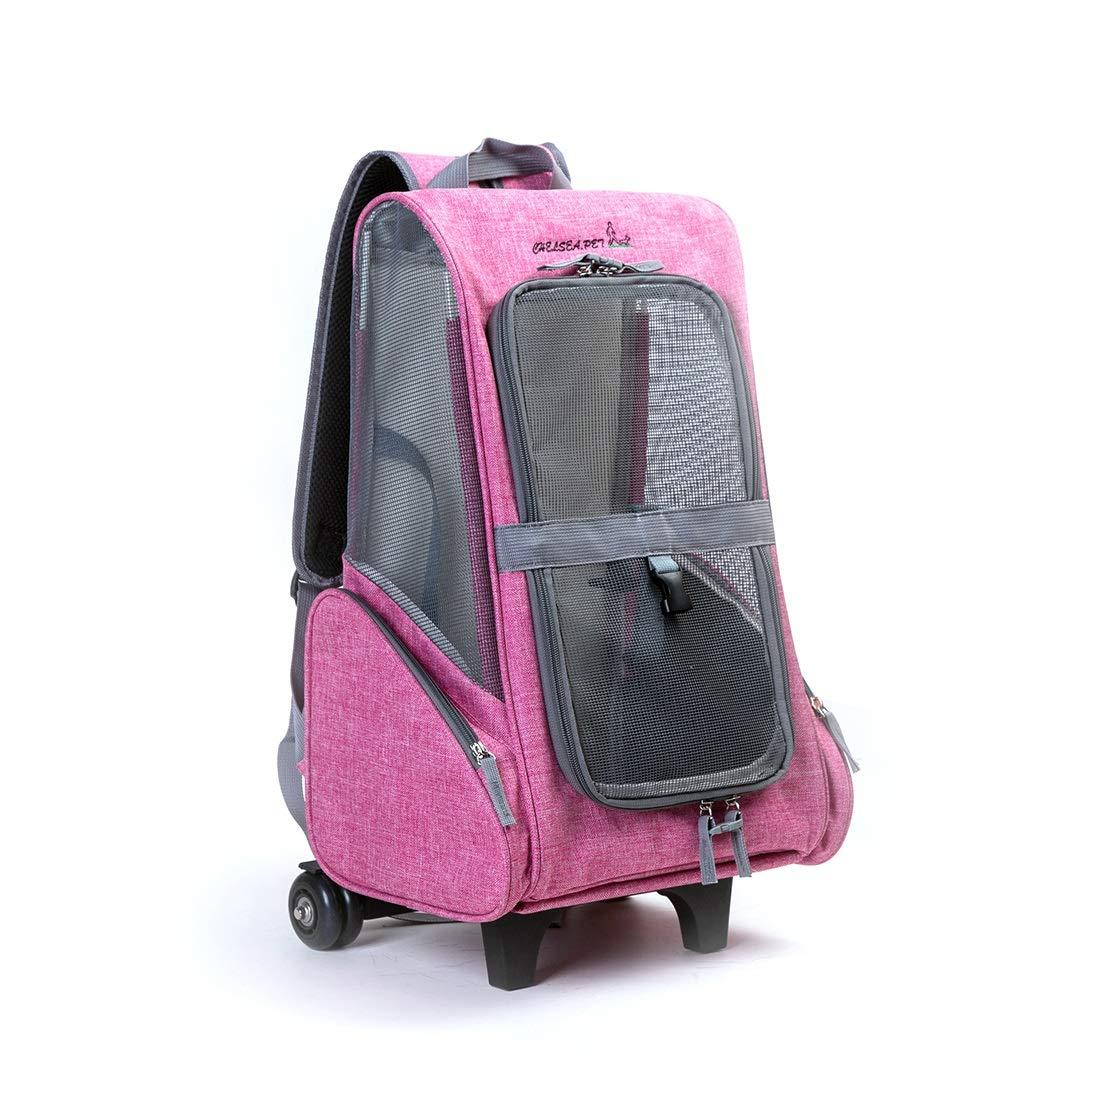 Cherry powder 23X28X55CM Cherry powder 23X28X55CM YY4 Pet Trolley Case Pet Double Trolley Case Pet Out Carrying Case Dog Backpack (color   Cherry Powder, Size   23X28X55CM)